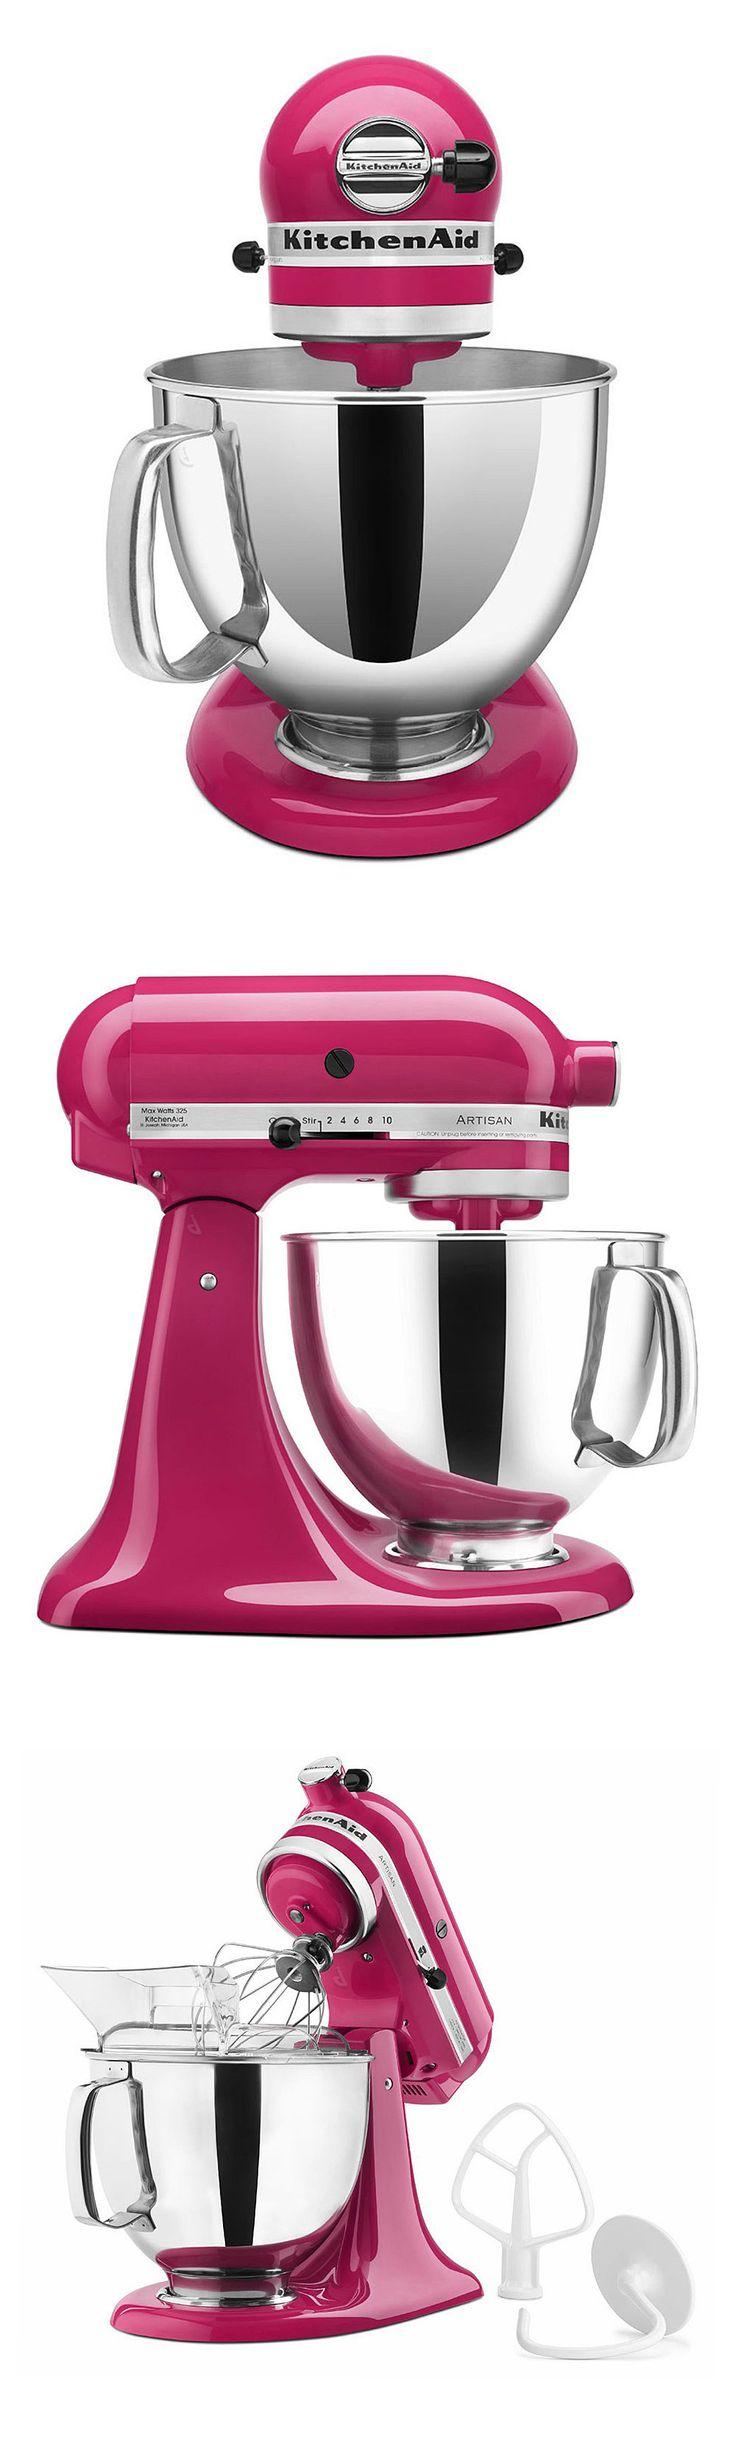 Kitchenaid artisan stand mixer in cranberry pink product design product design - Flamingo pink kitchenaid mixer ...